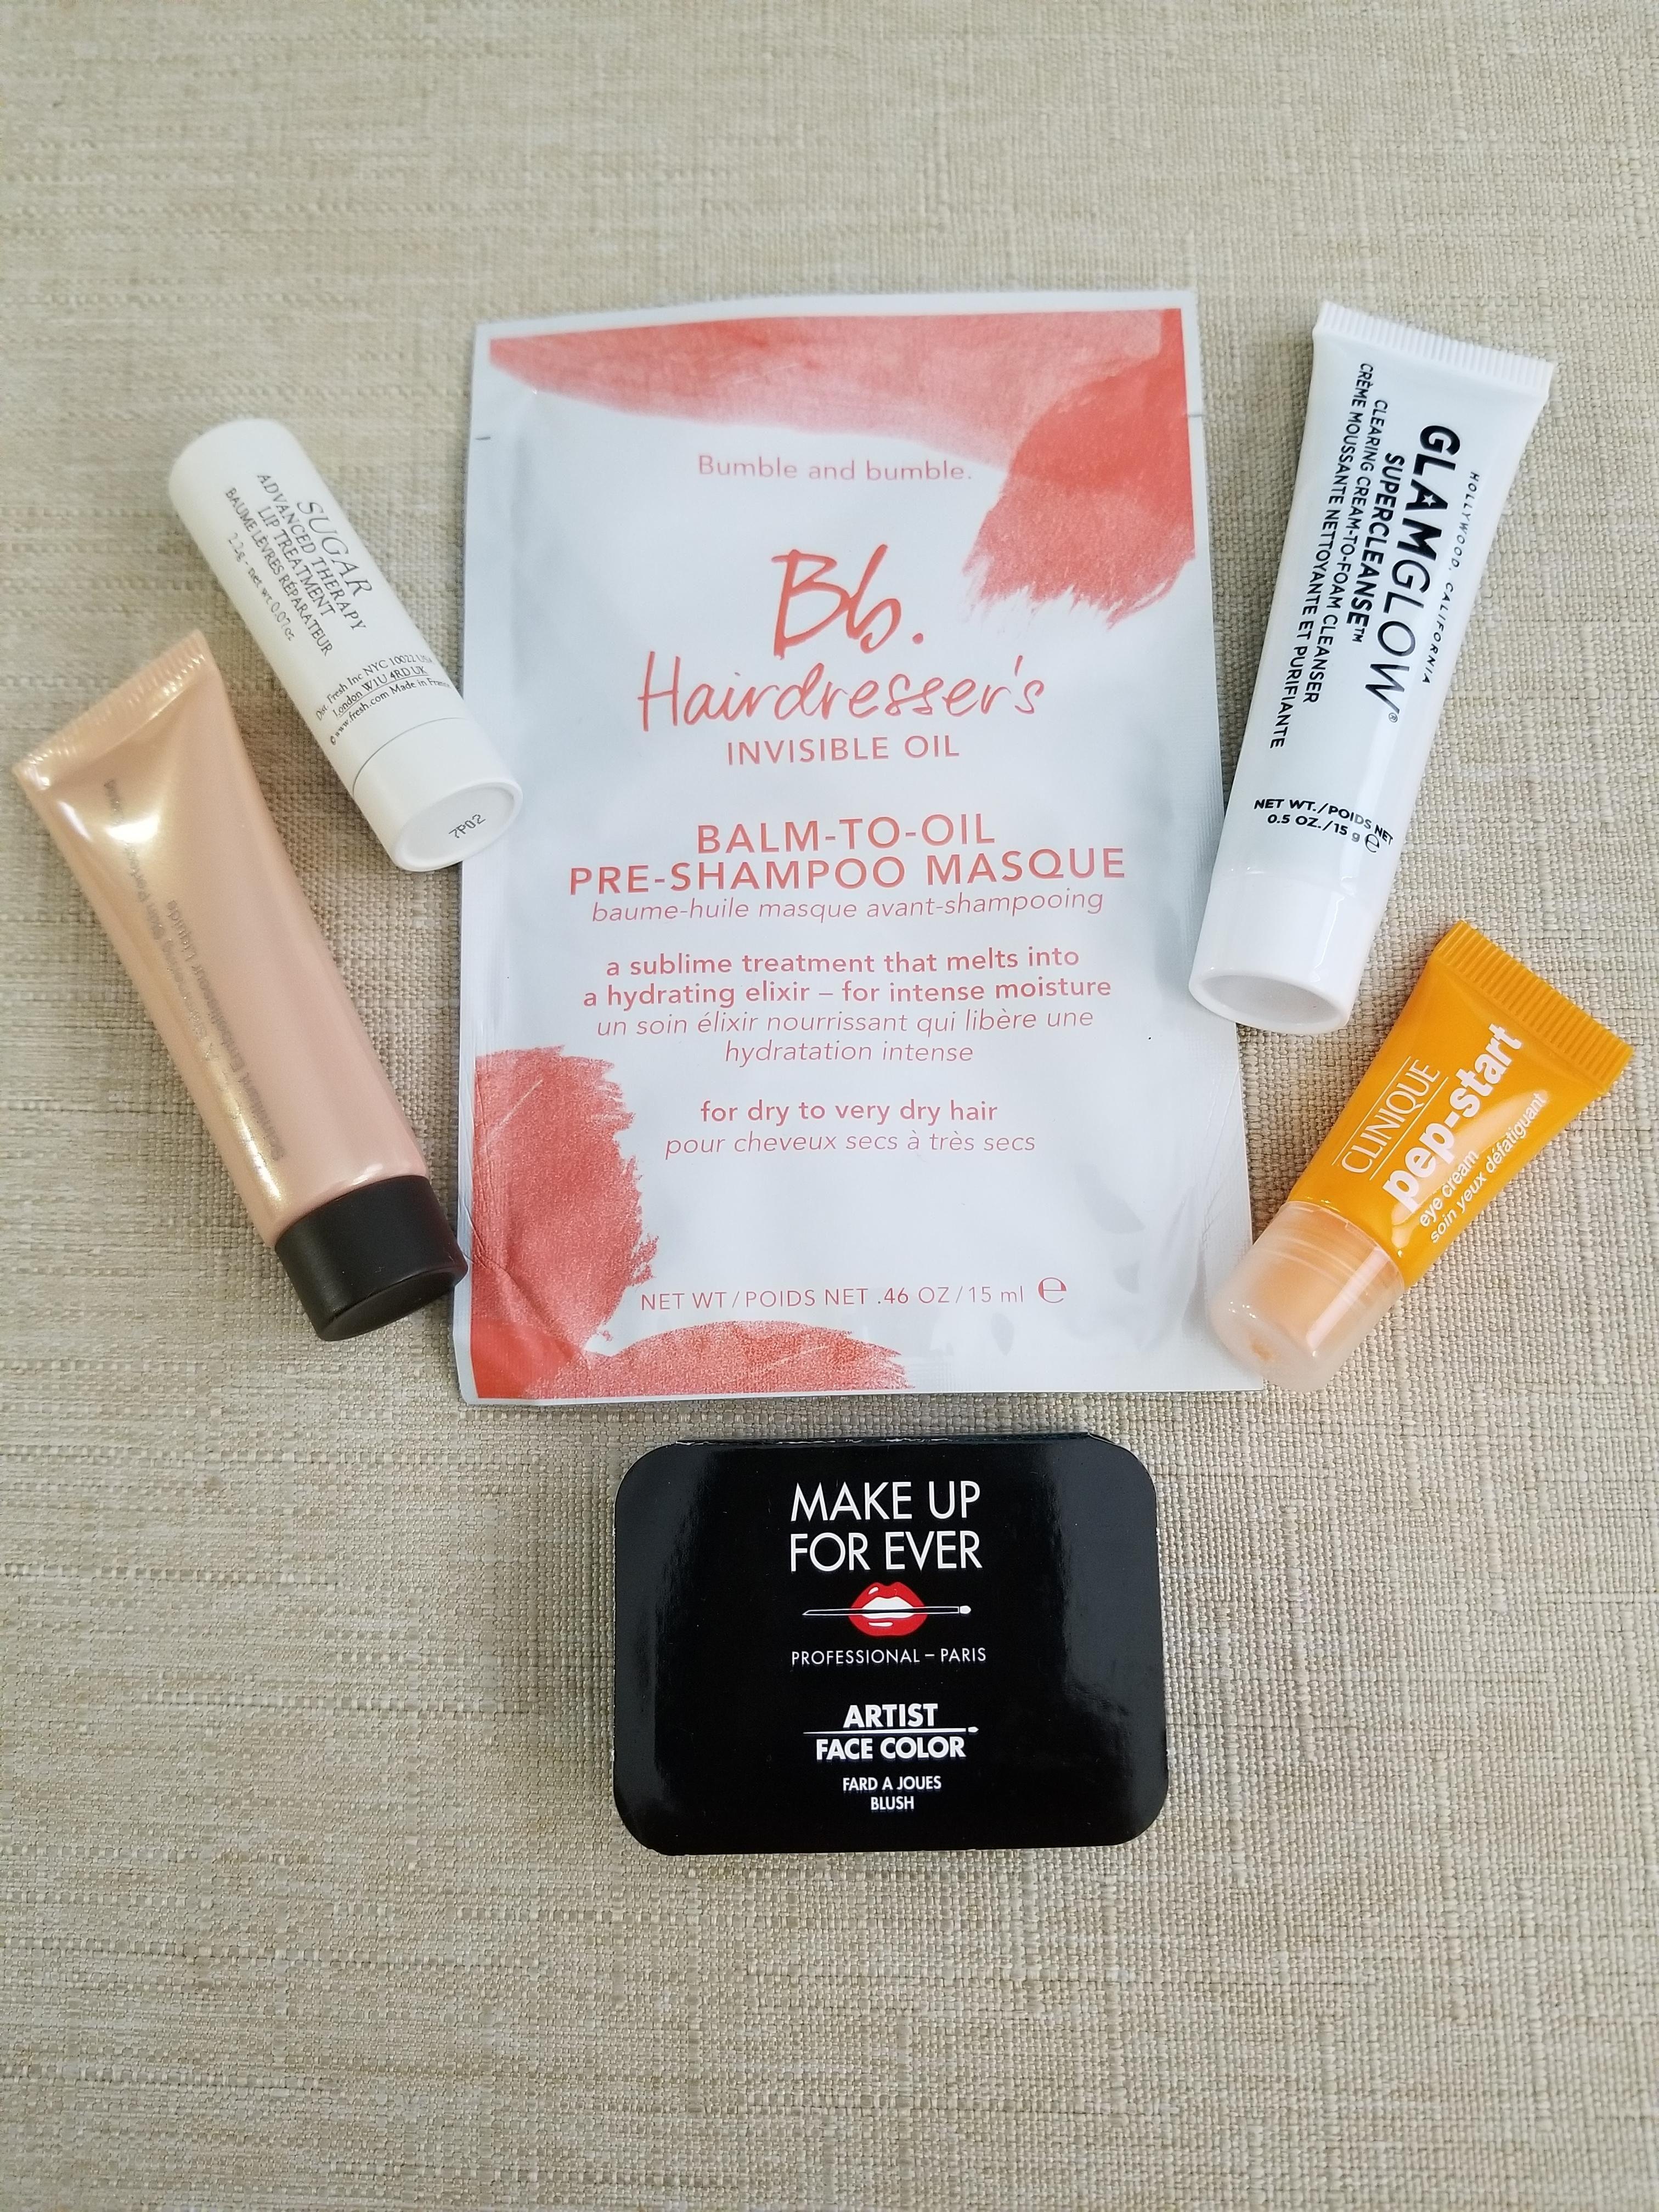 Sephora Play Hair Skin and Cosmetics Pinterest Sephora